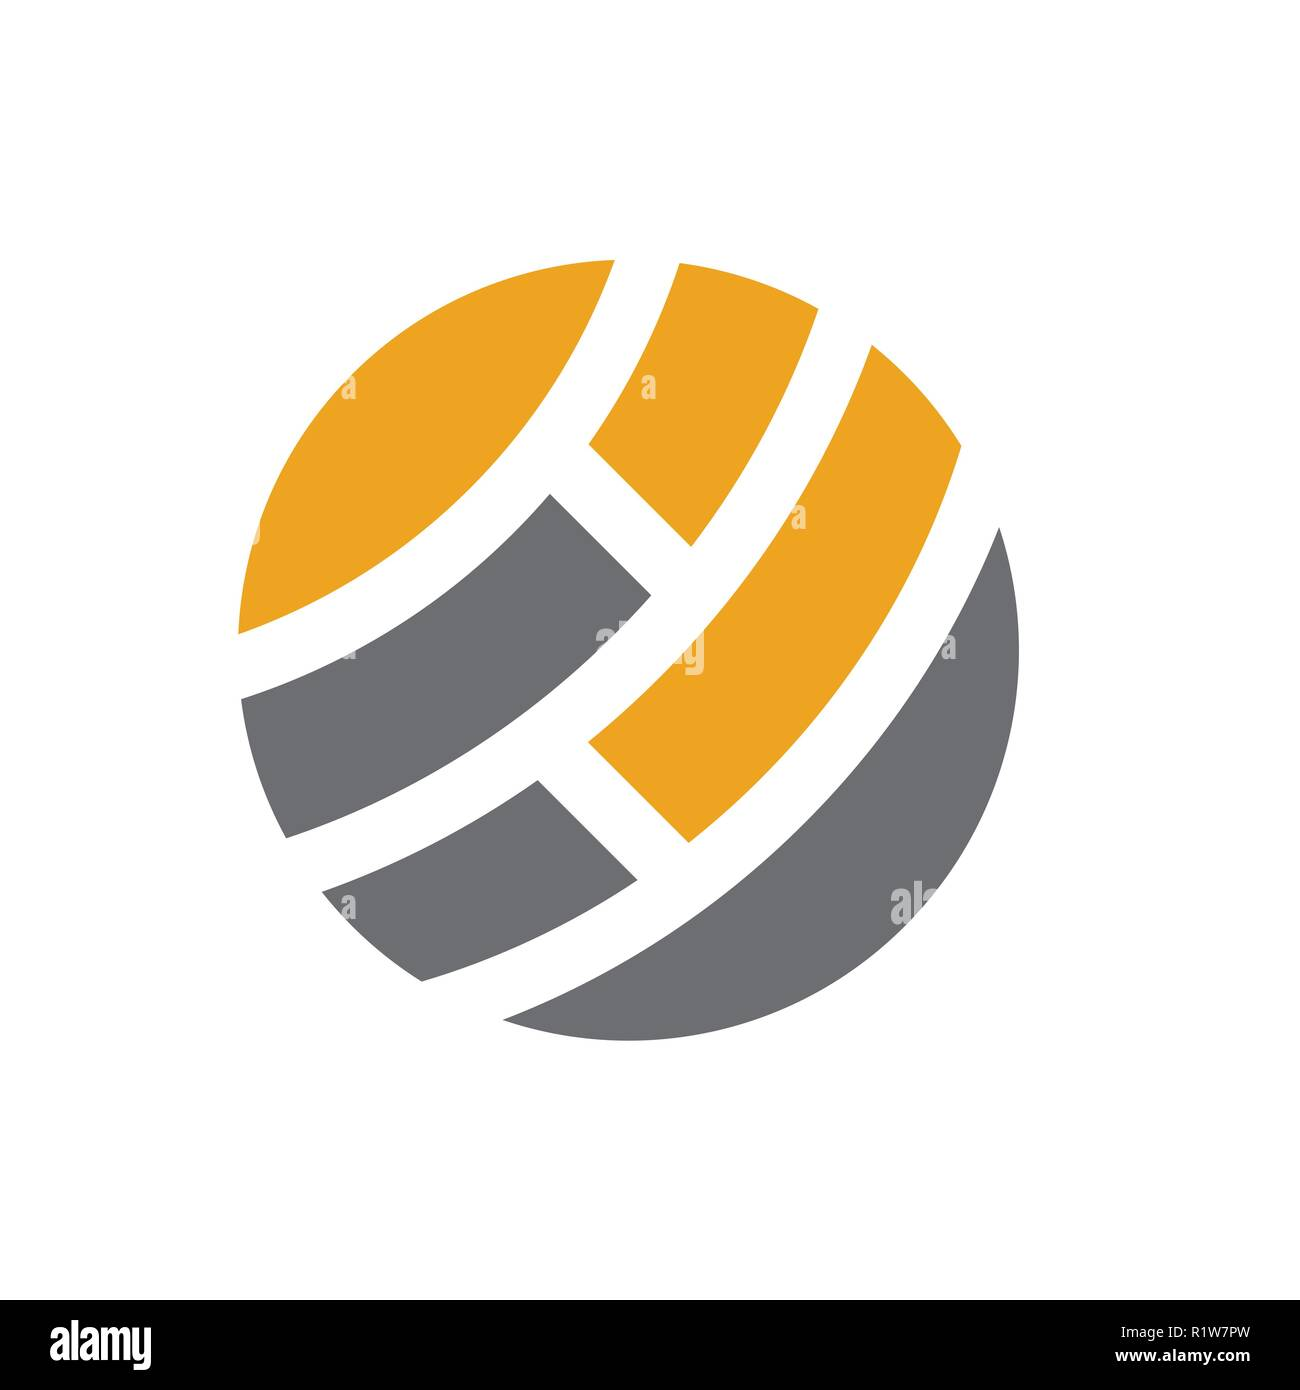 Global Abstract Logo Design - Stock Image